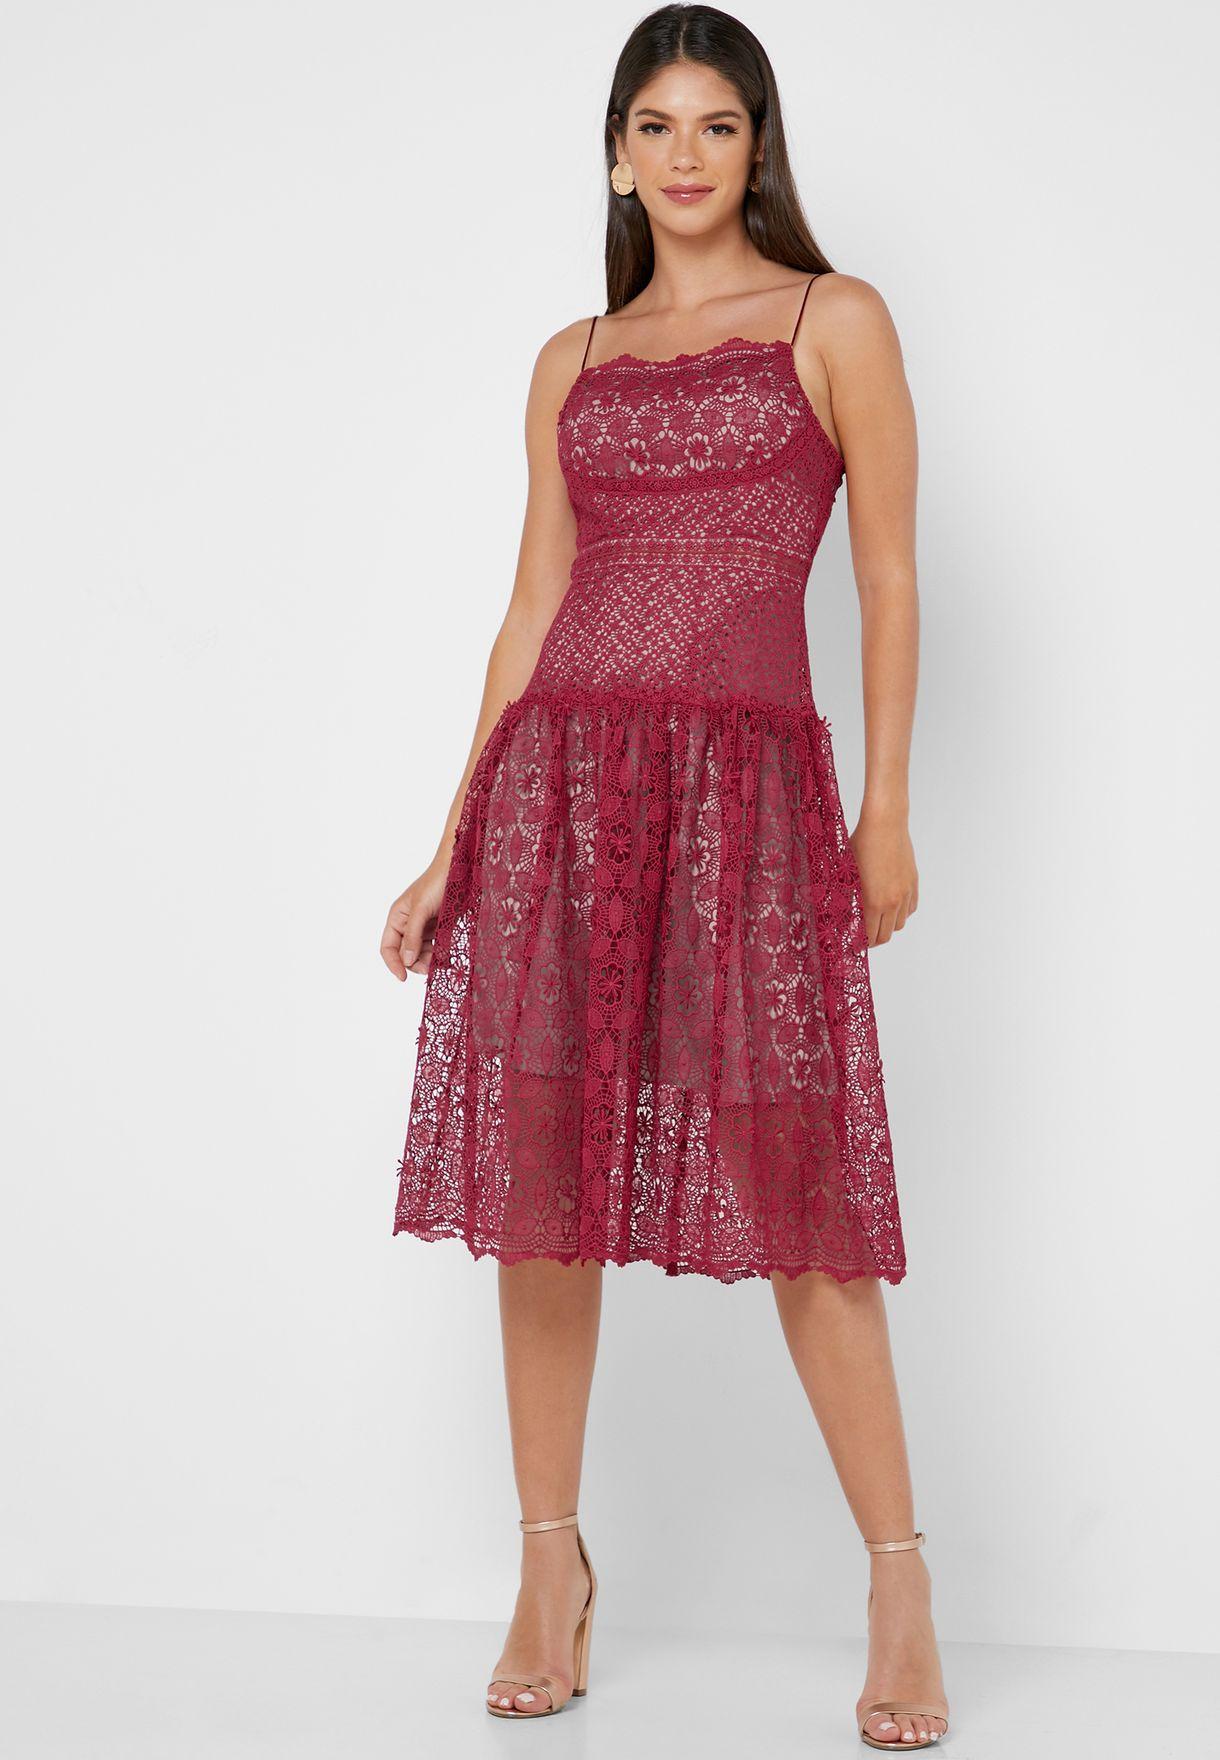 Sheer Detail Lace Skater Dress